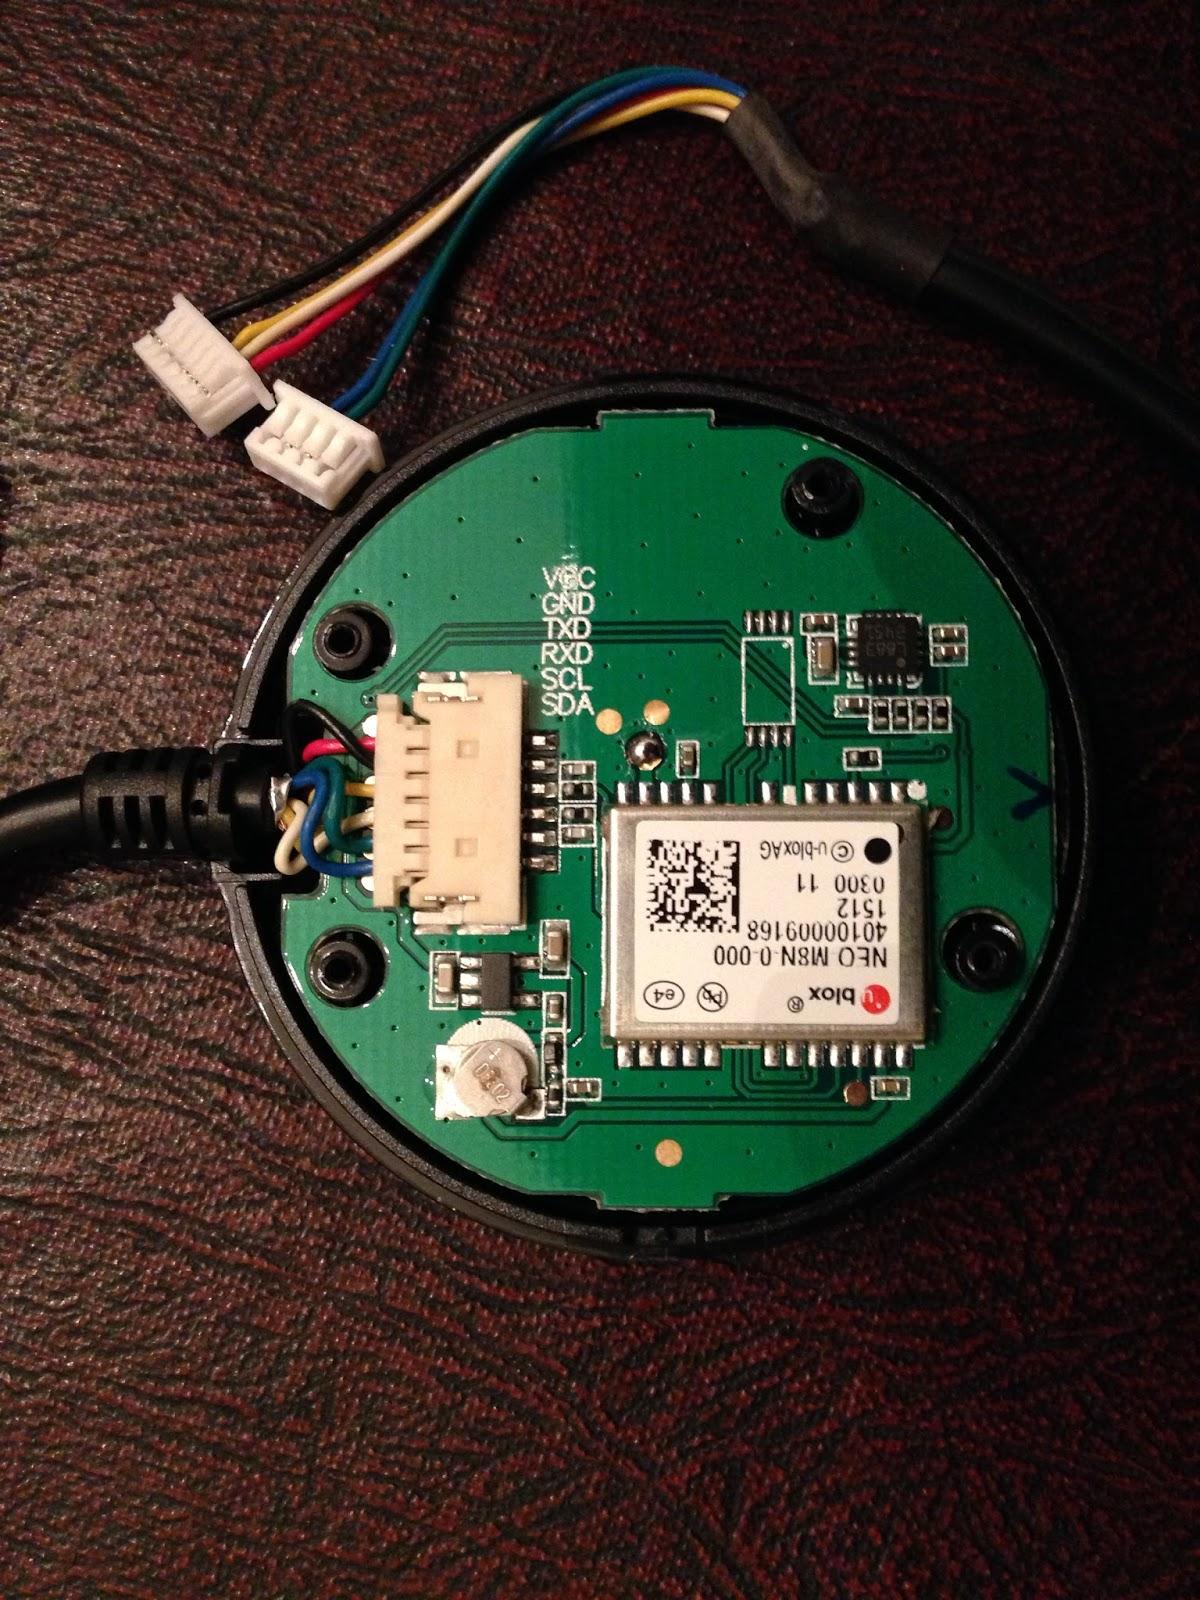 Quadcopter-Robotics: Two uBlox GPS & Compass combo-modules